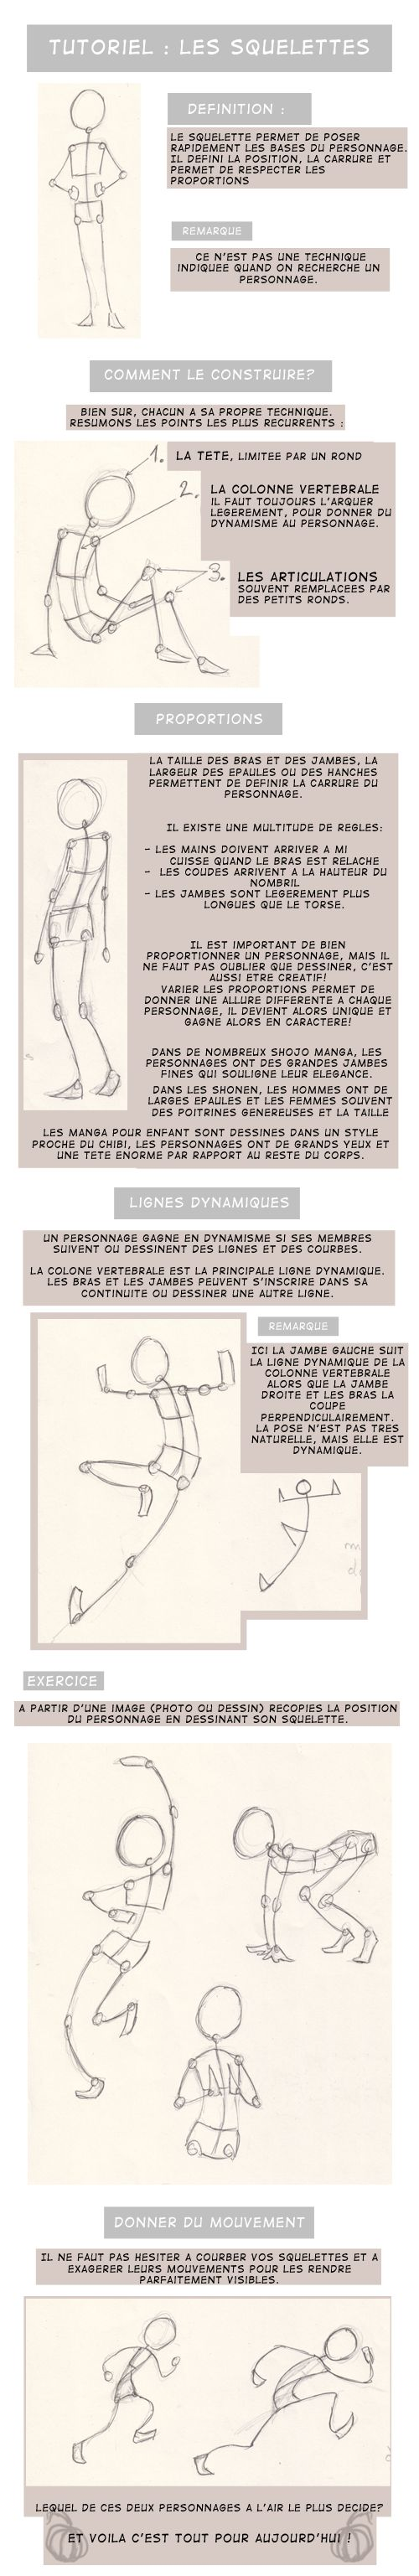 Tuto squelette -only french- by potiron02.deviantart.com on @deviantART